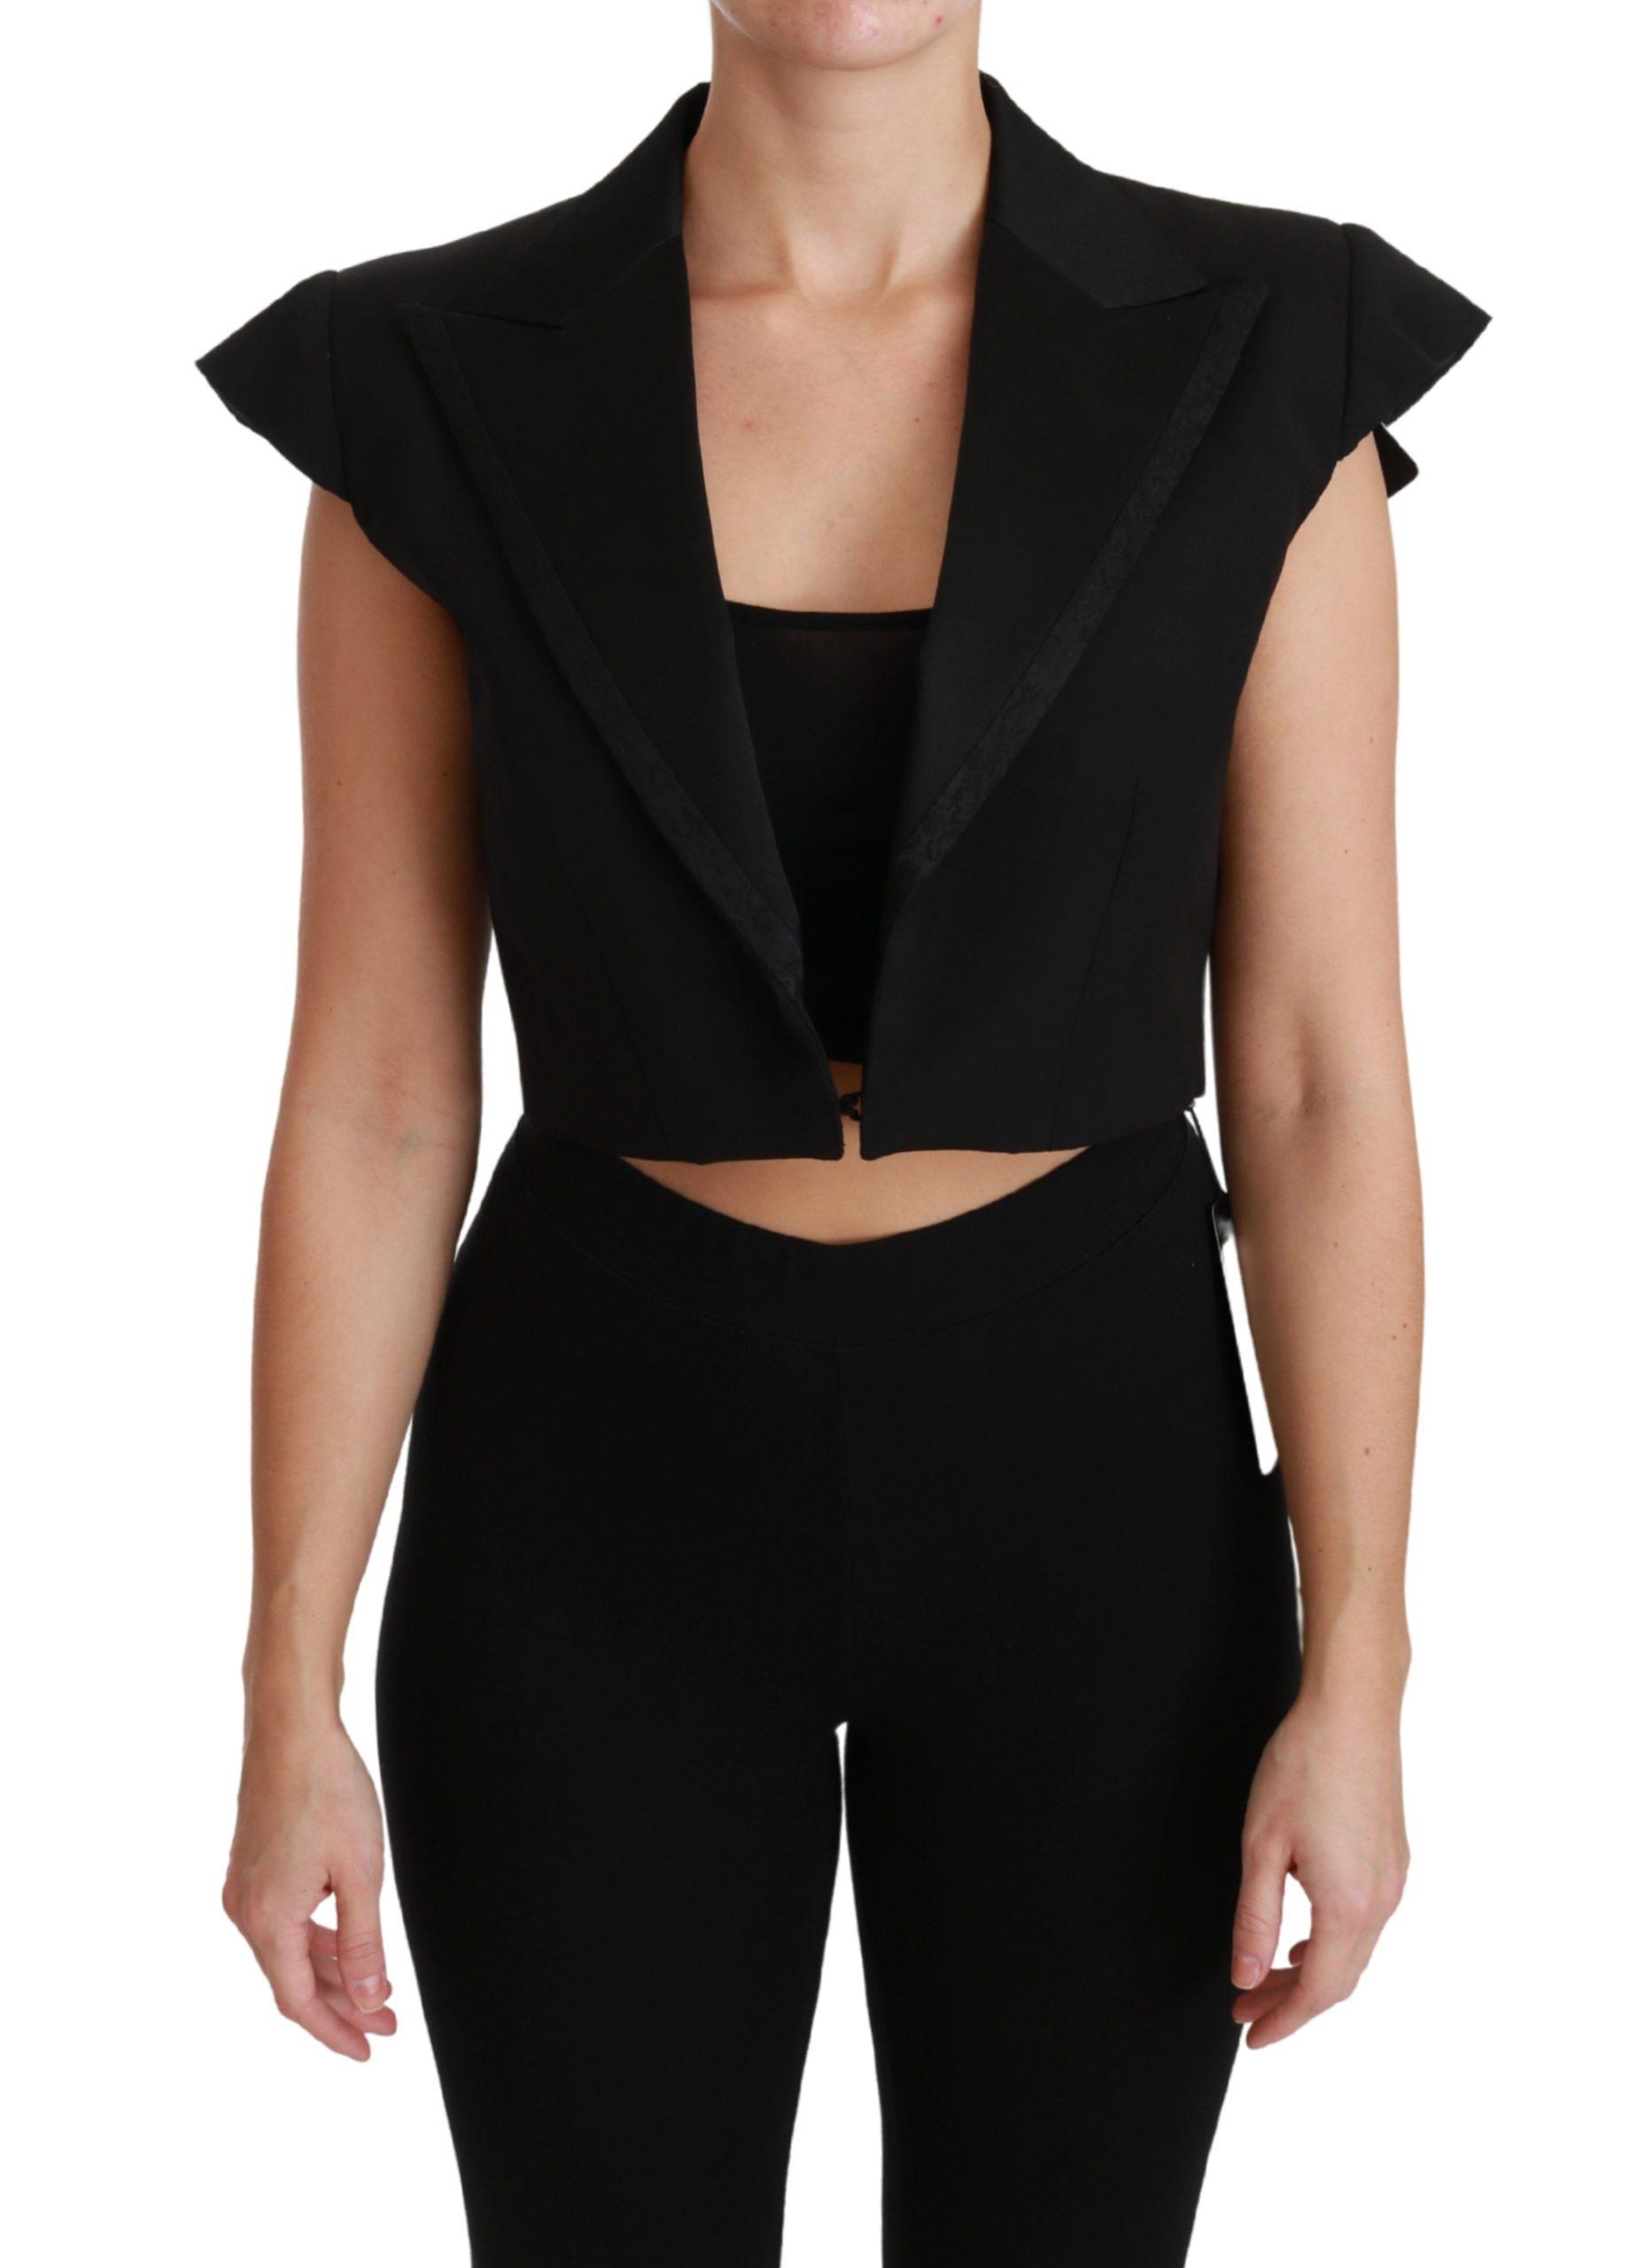 Dolce & Gabbana Women's Sleeveless Cropped Wool Blazer Black JKT2568 - IT40|S